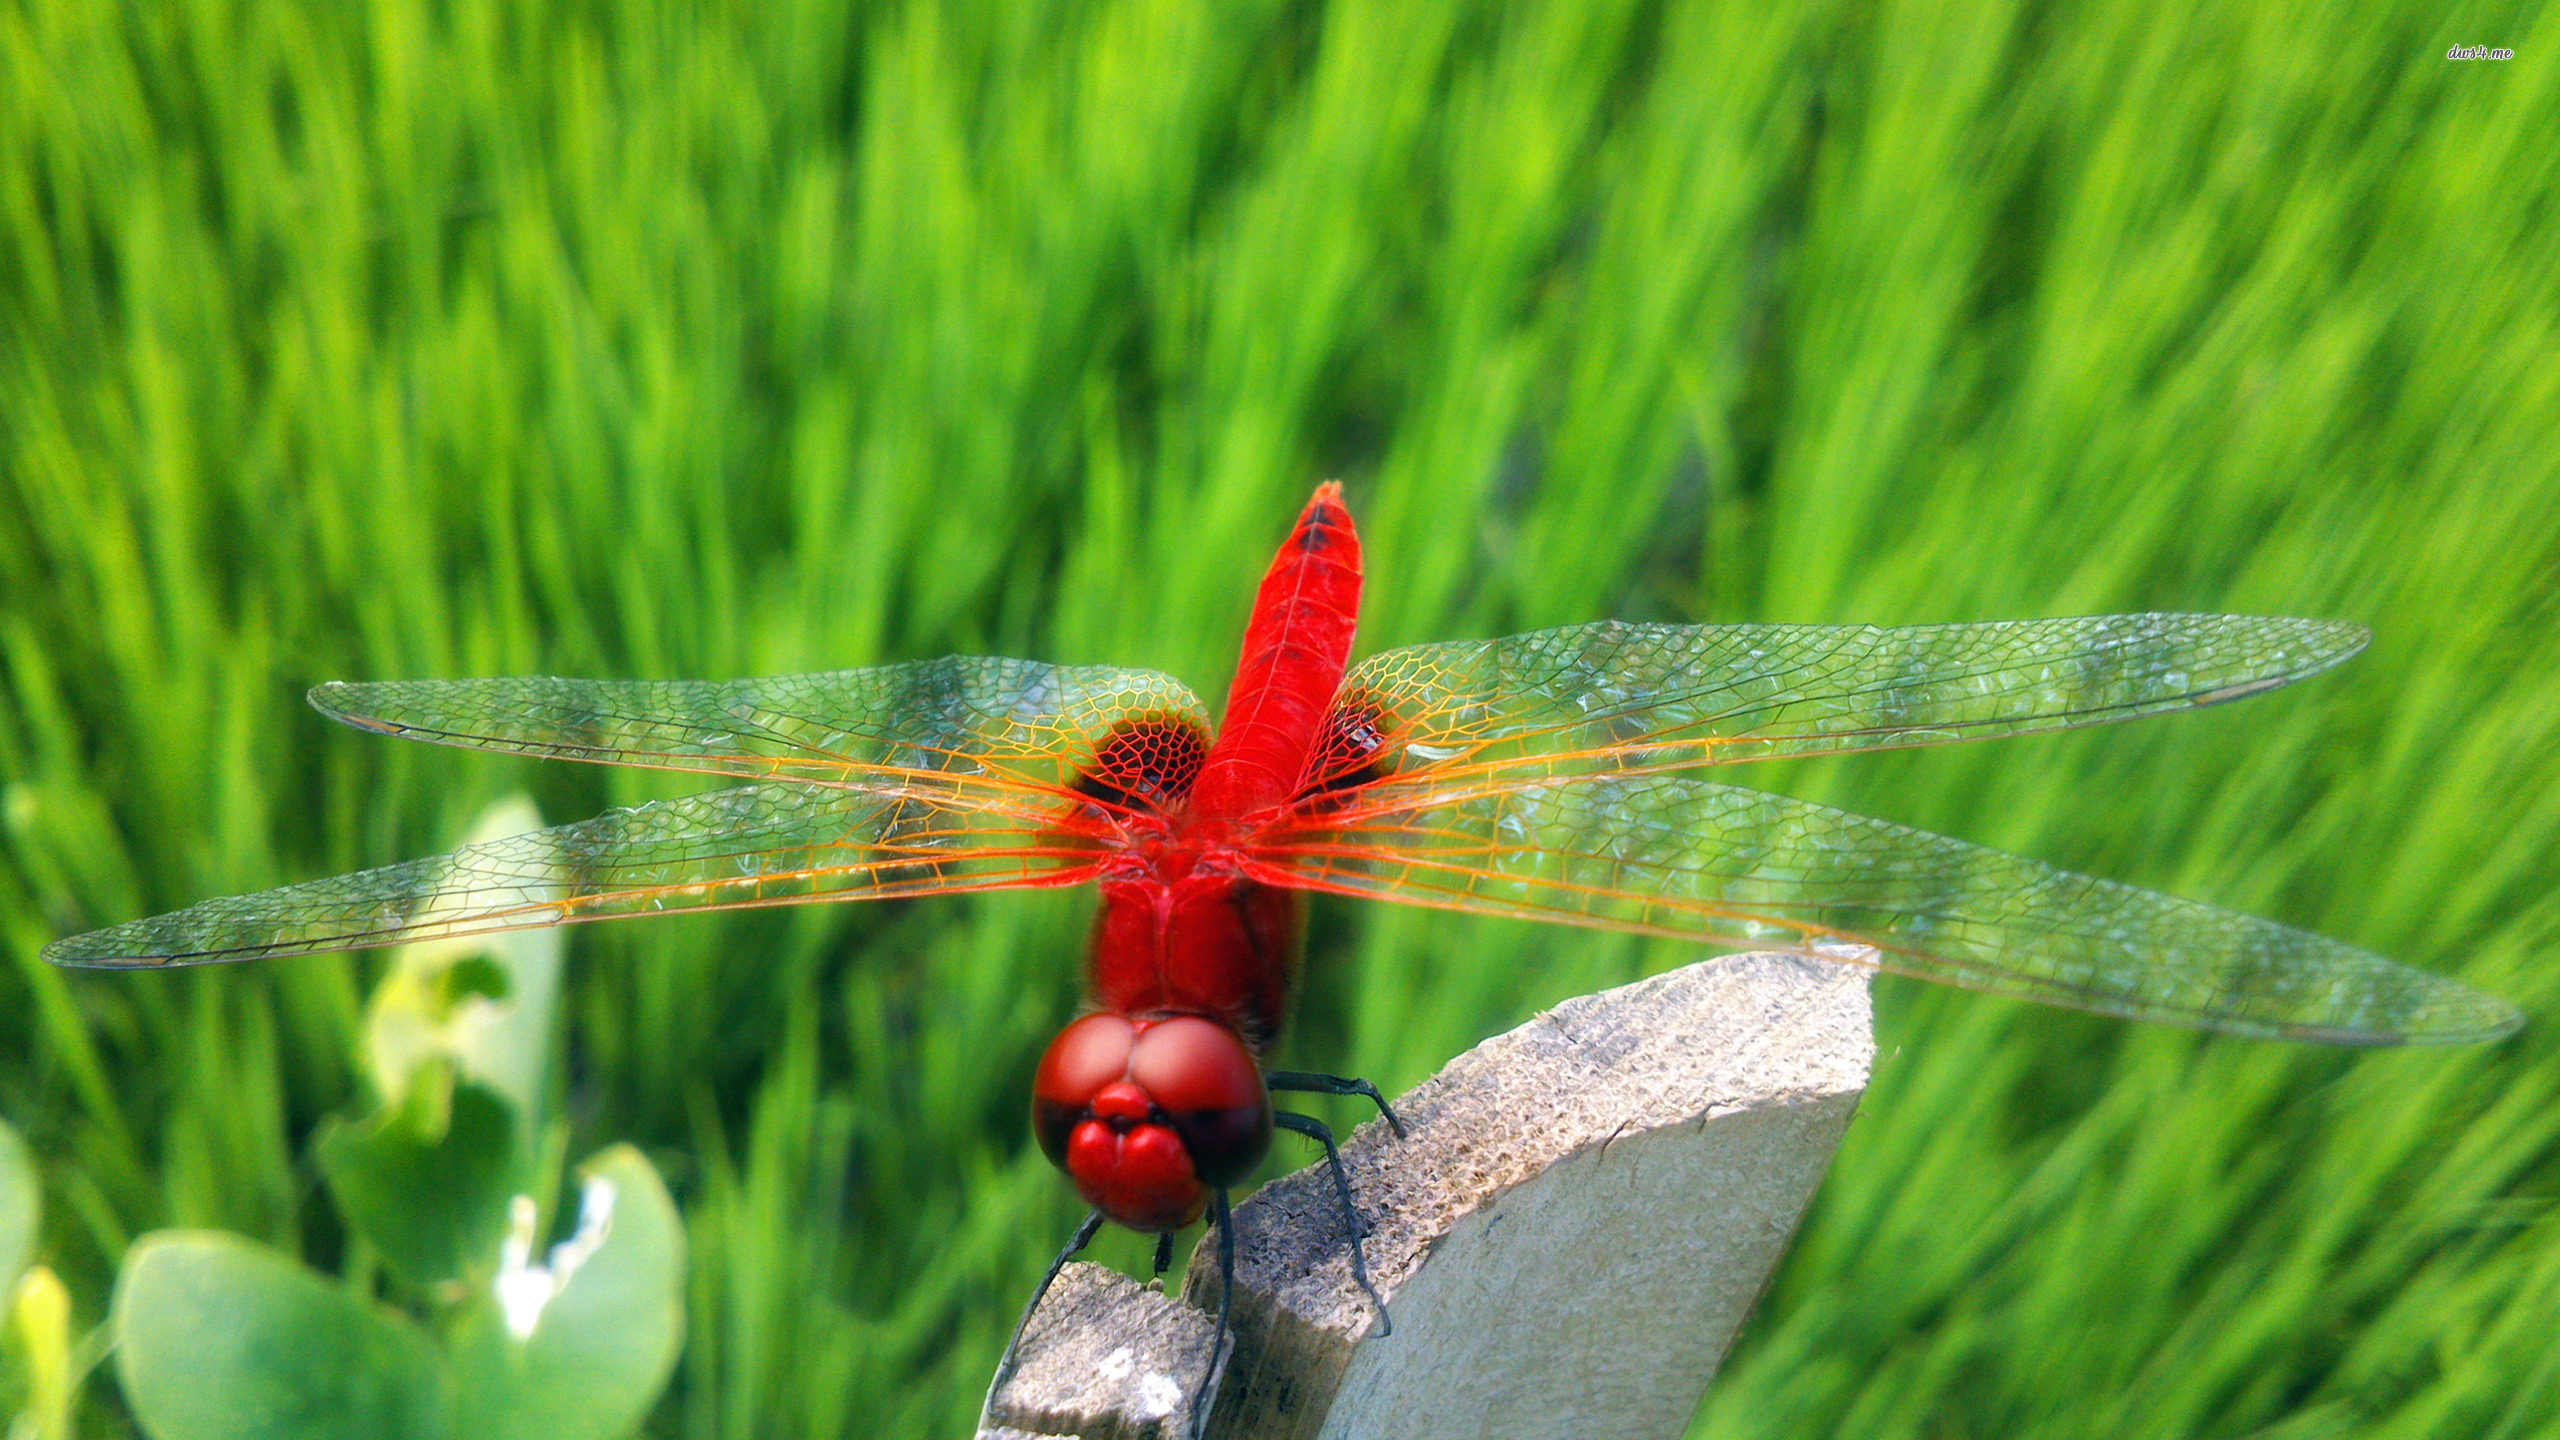 Animal - Dragonfly  Wallpaper